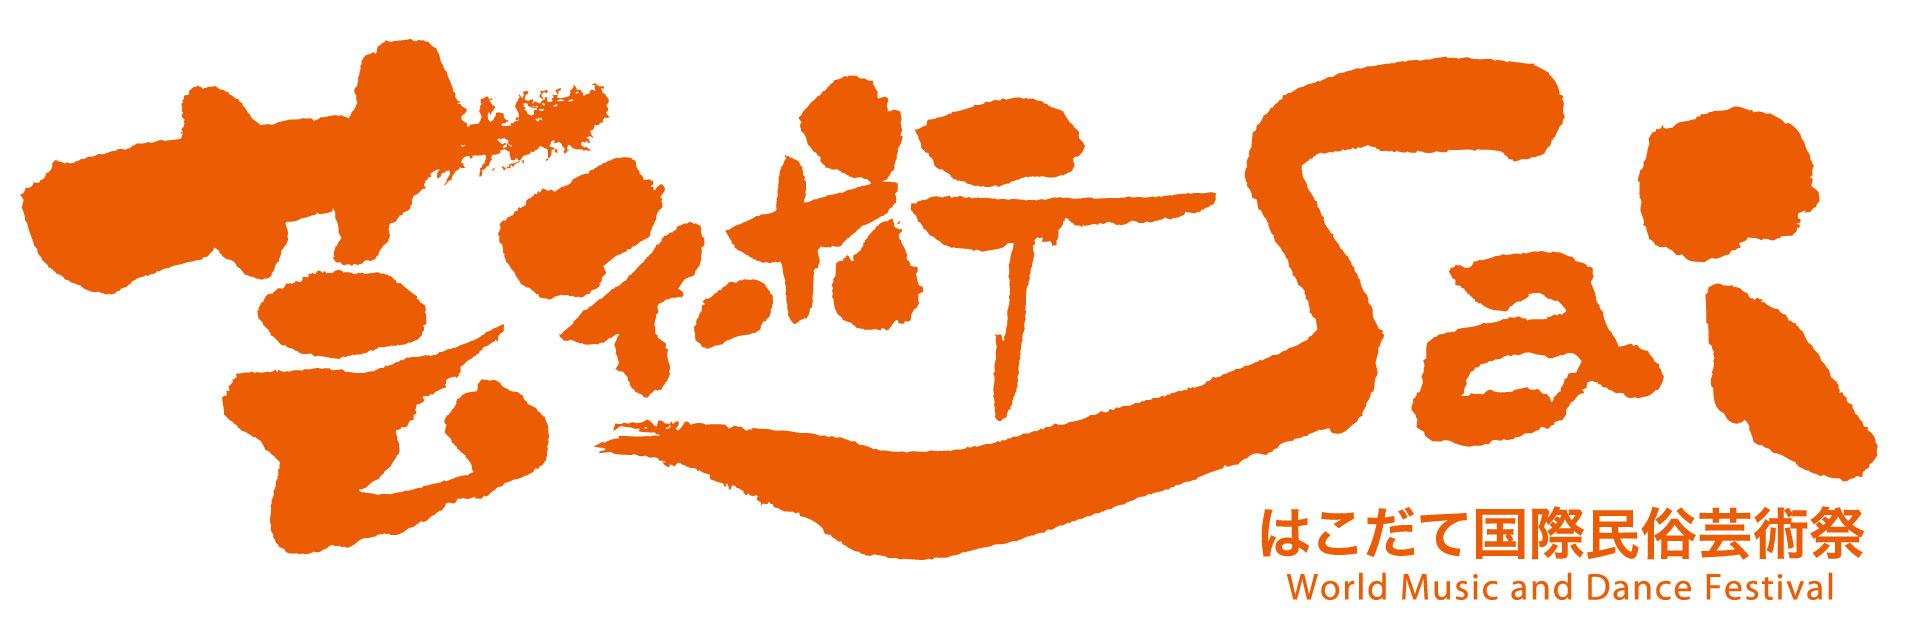 WMDF-Logotype2